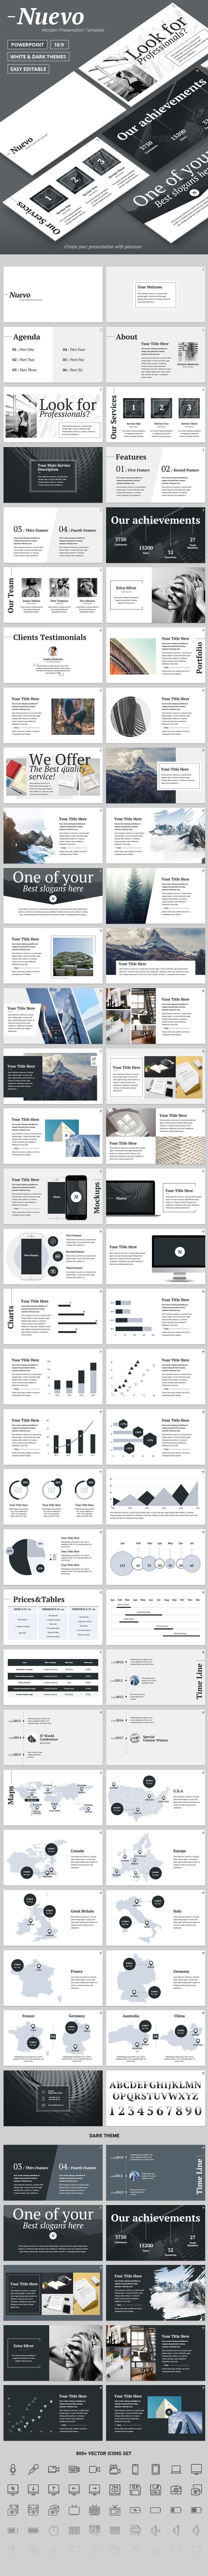 Nuevo - Modern & Clean PowerPoint Template (PowerPoint Templates)